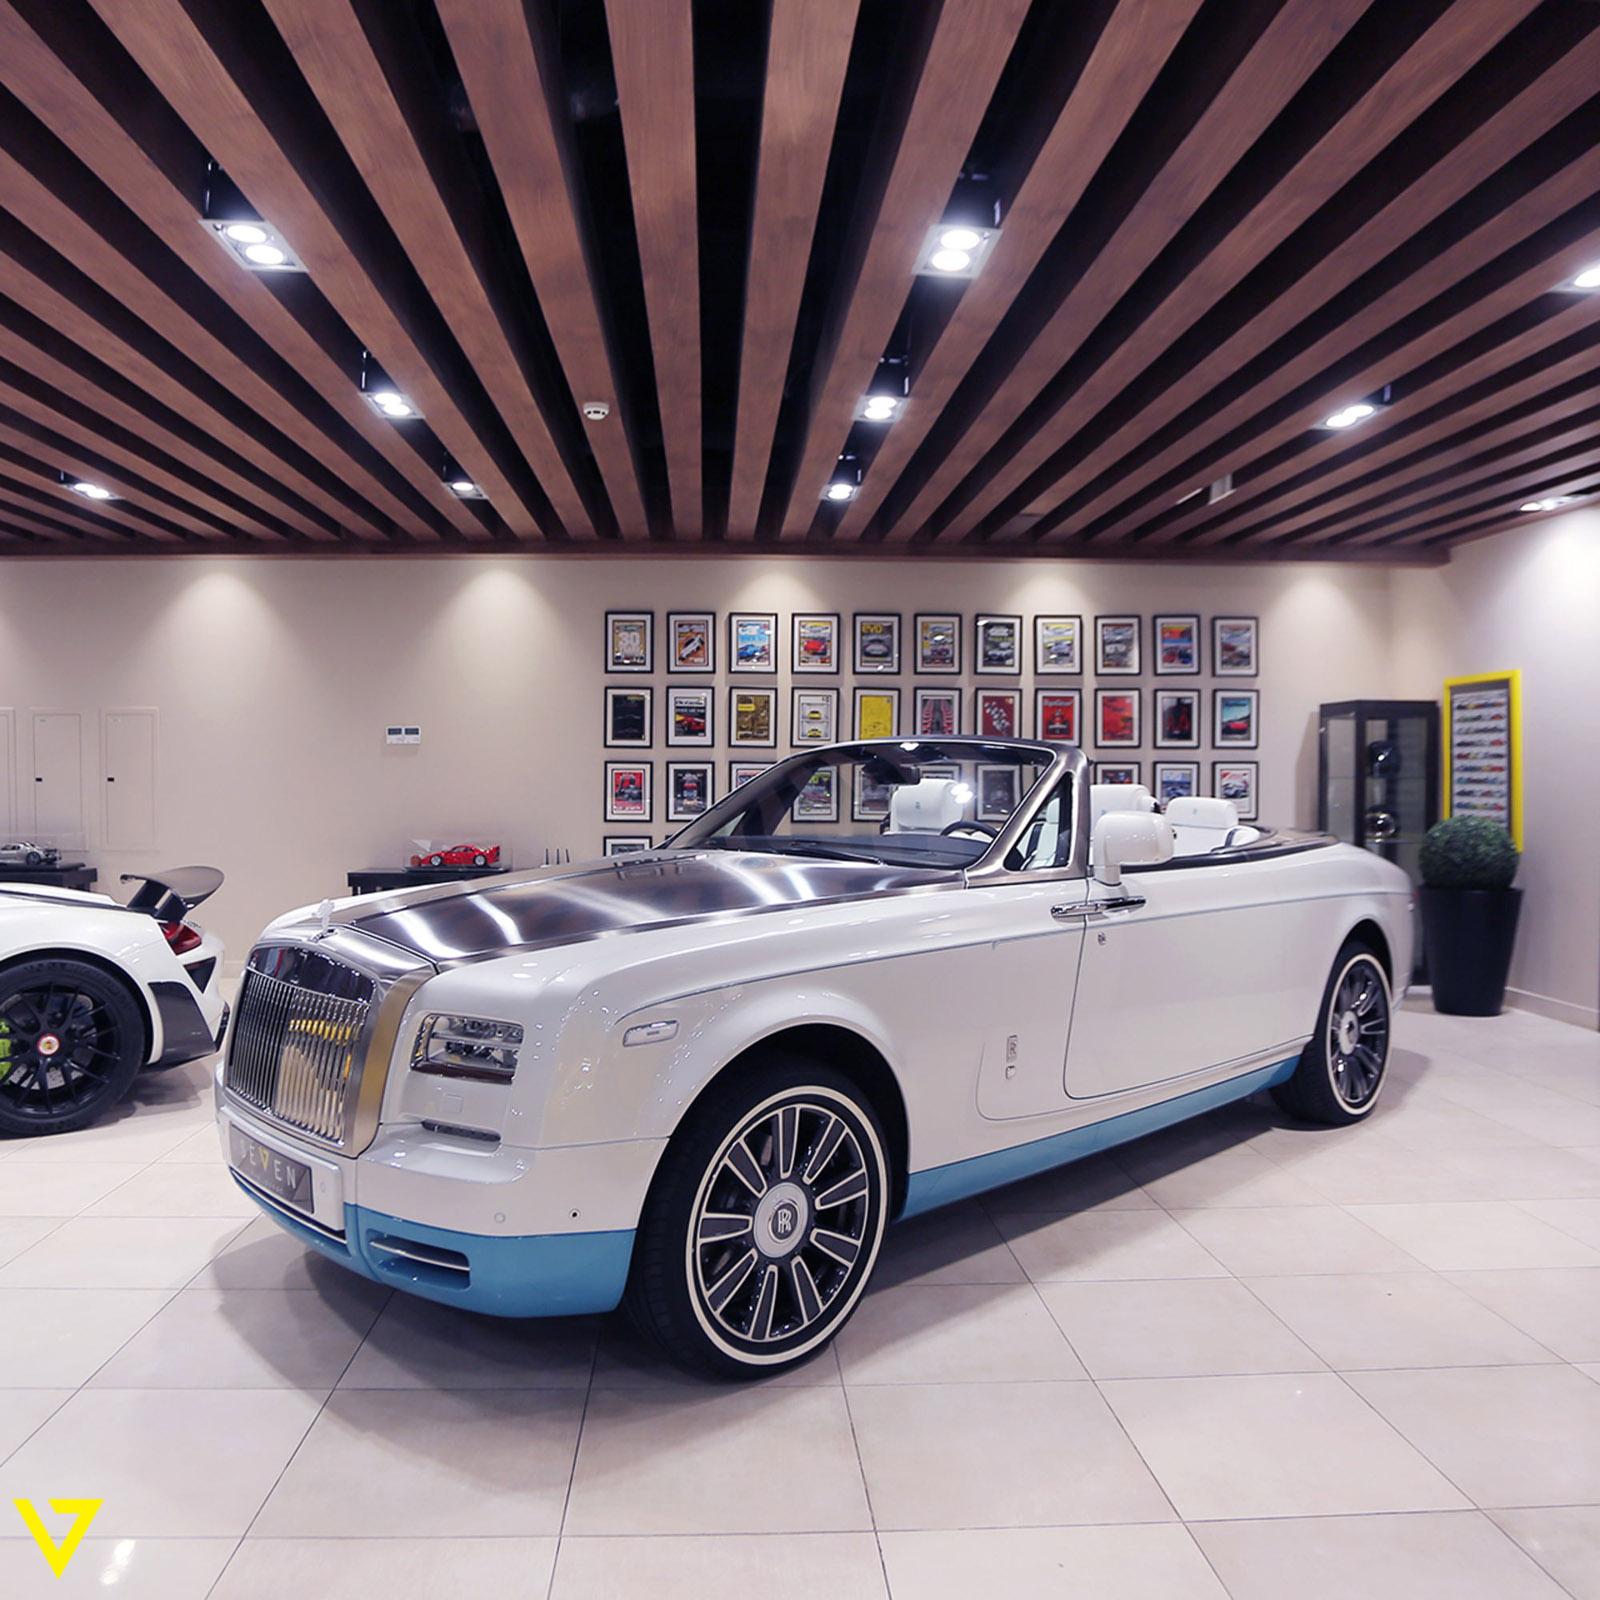 Rolls-Royce_Phantom_Drophead_Coupe_Last-of-Last_edition_03